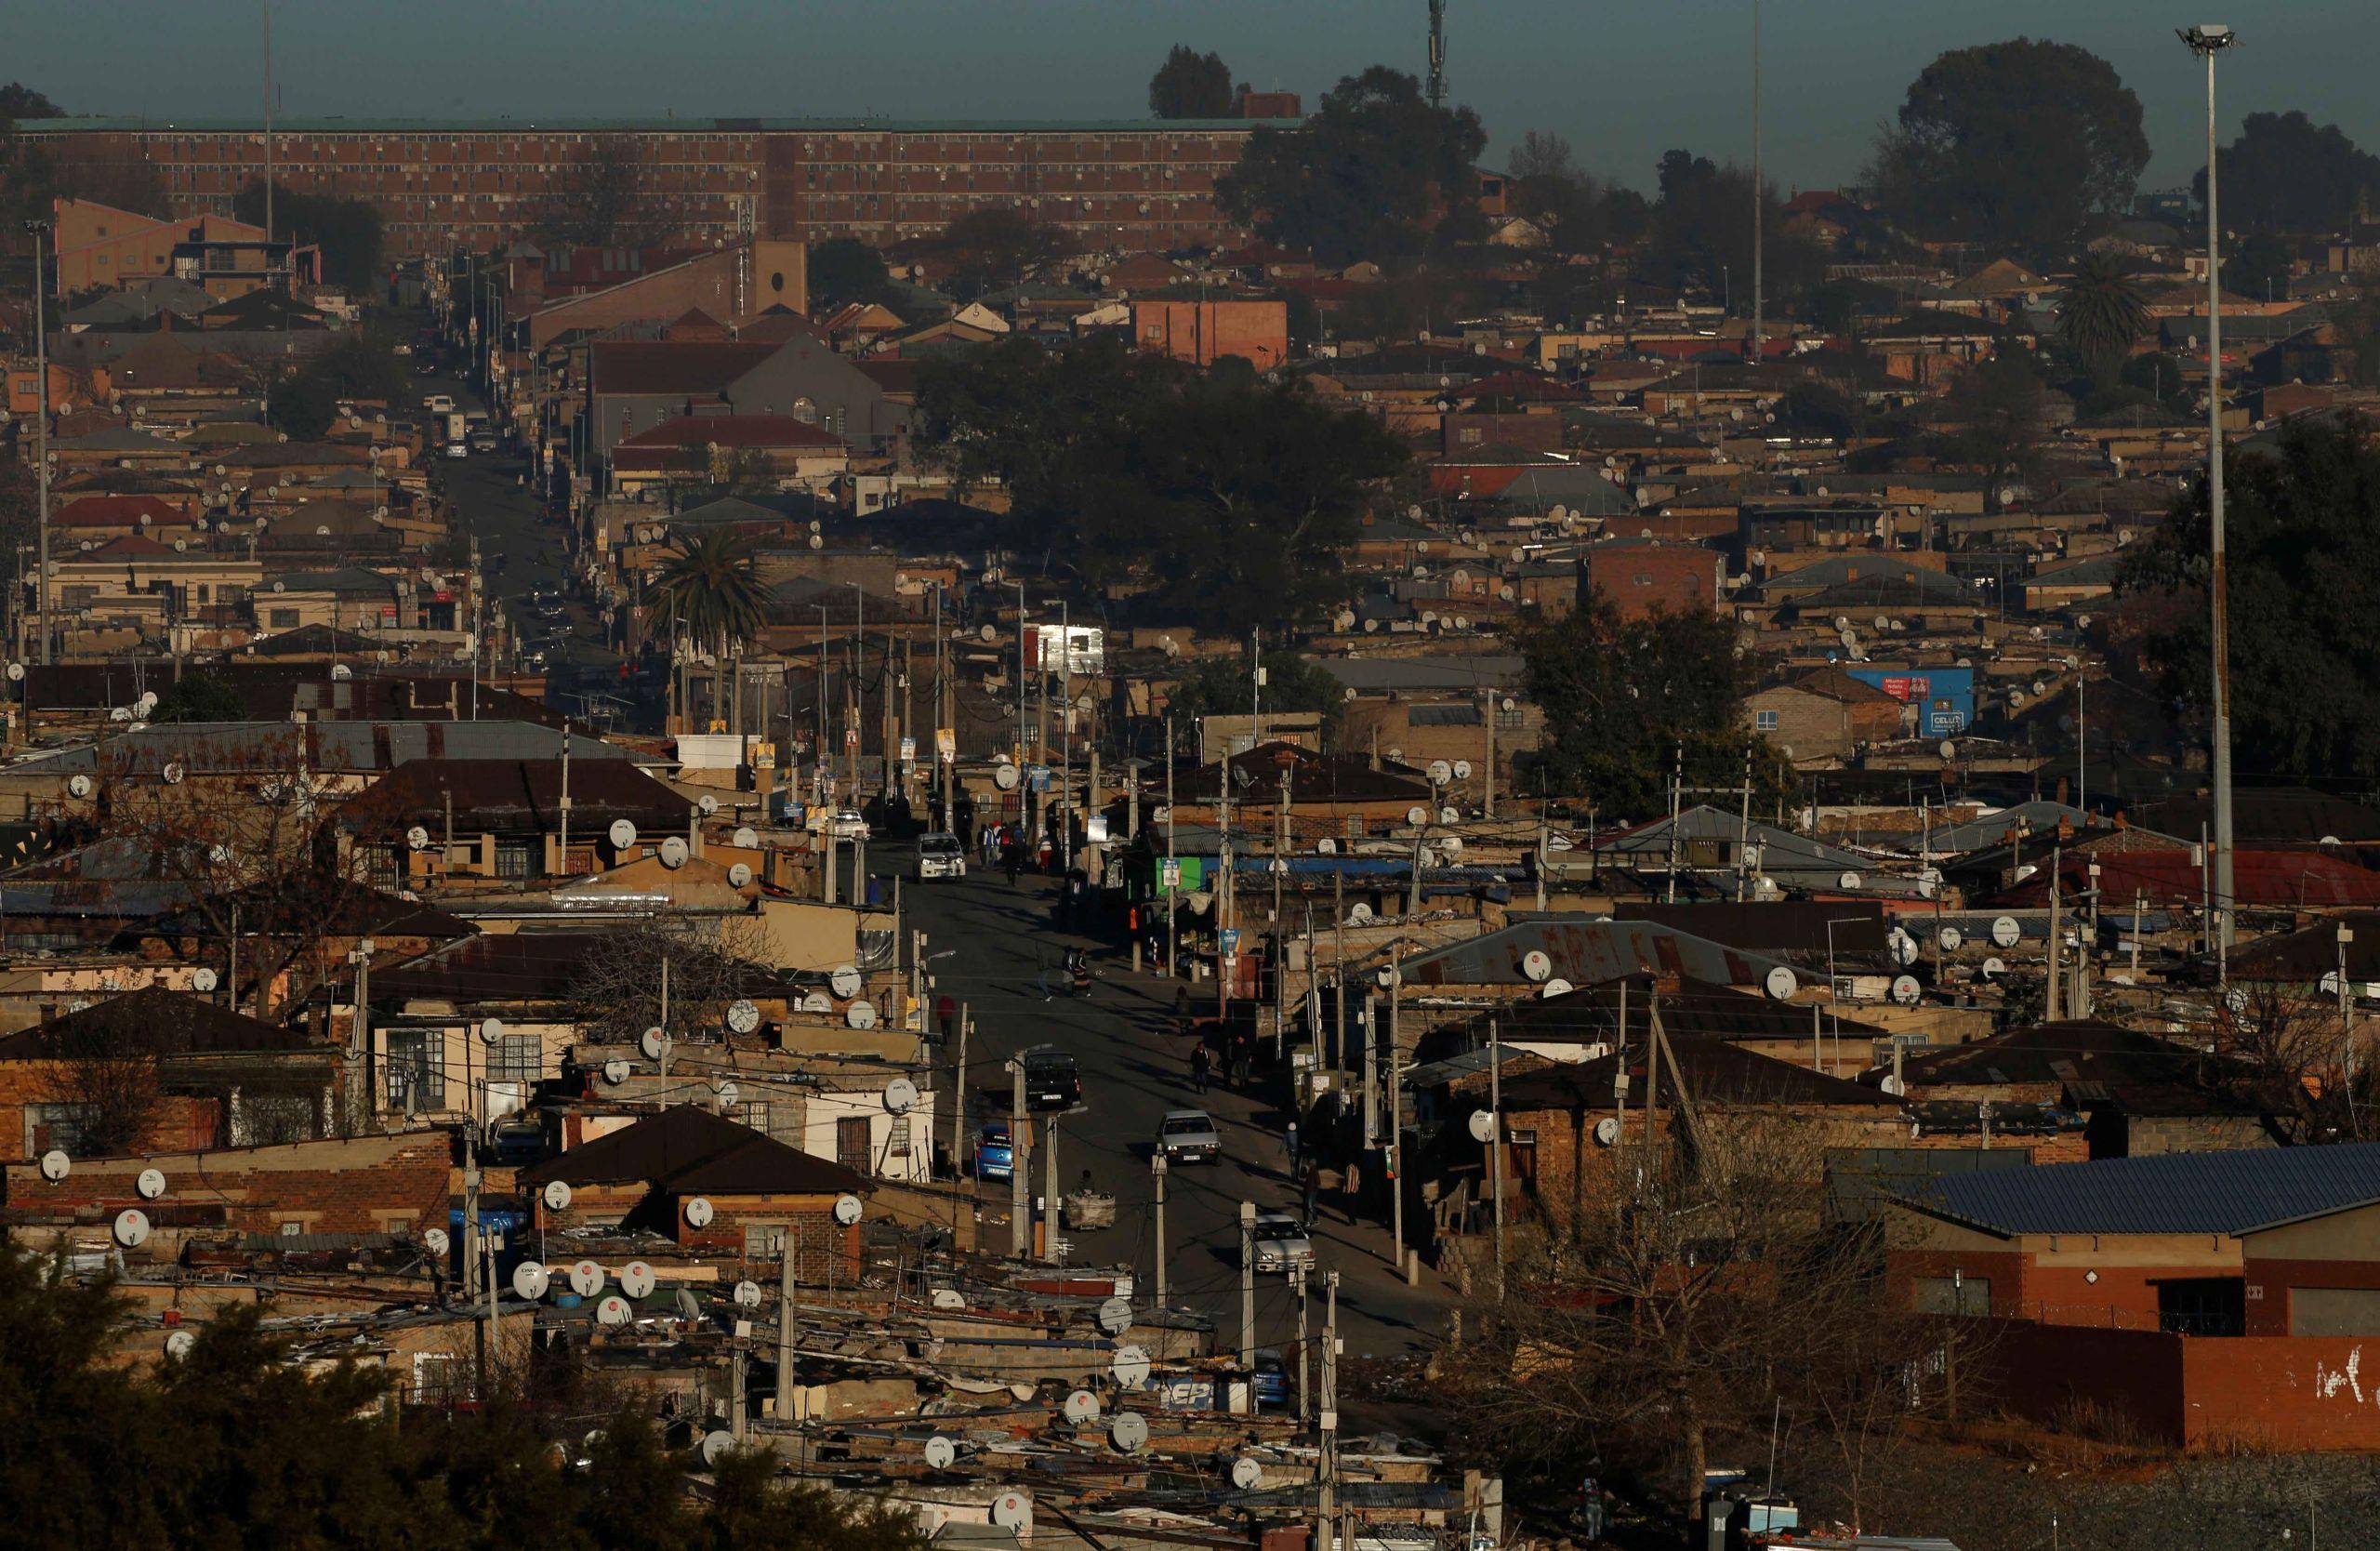 Alexandra Township城市风貌图,该地区是为大量无法获得合适居住地的南非人提供的临时居所,位于南非约翰内斯堡桑顿郊区的富人汇集区附近,2016年7月28日。路透社Siphiwe Sibeko摄。